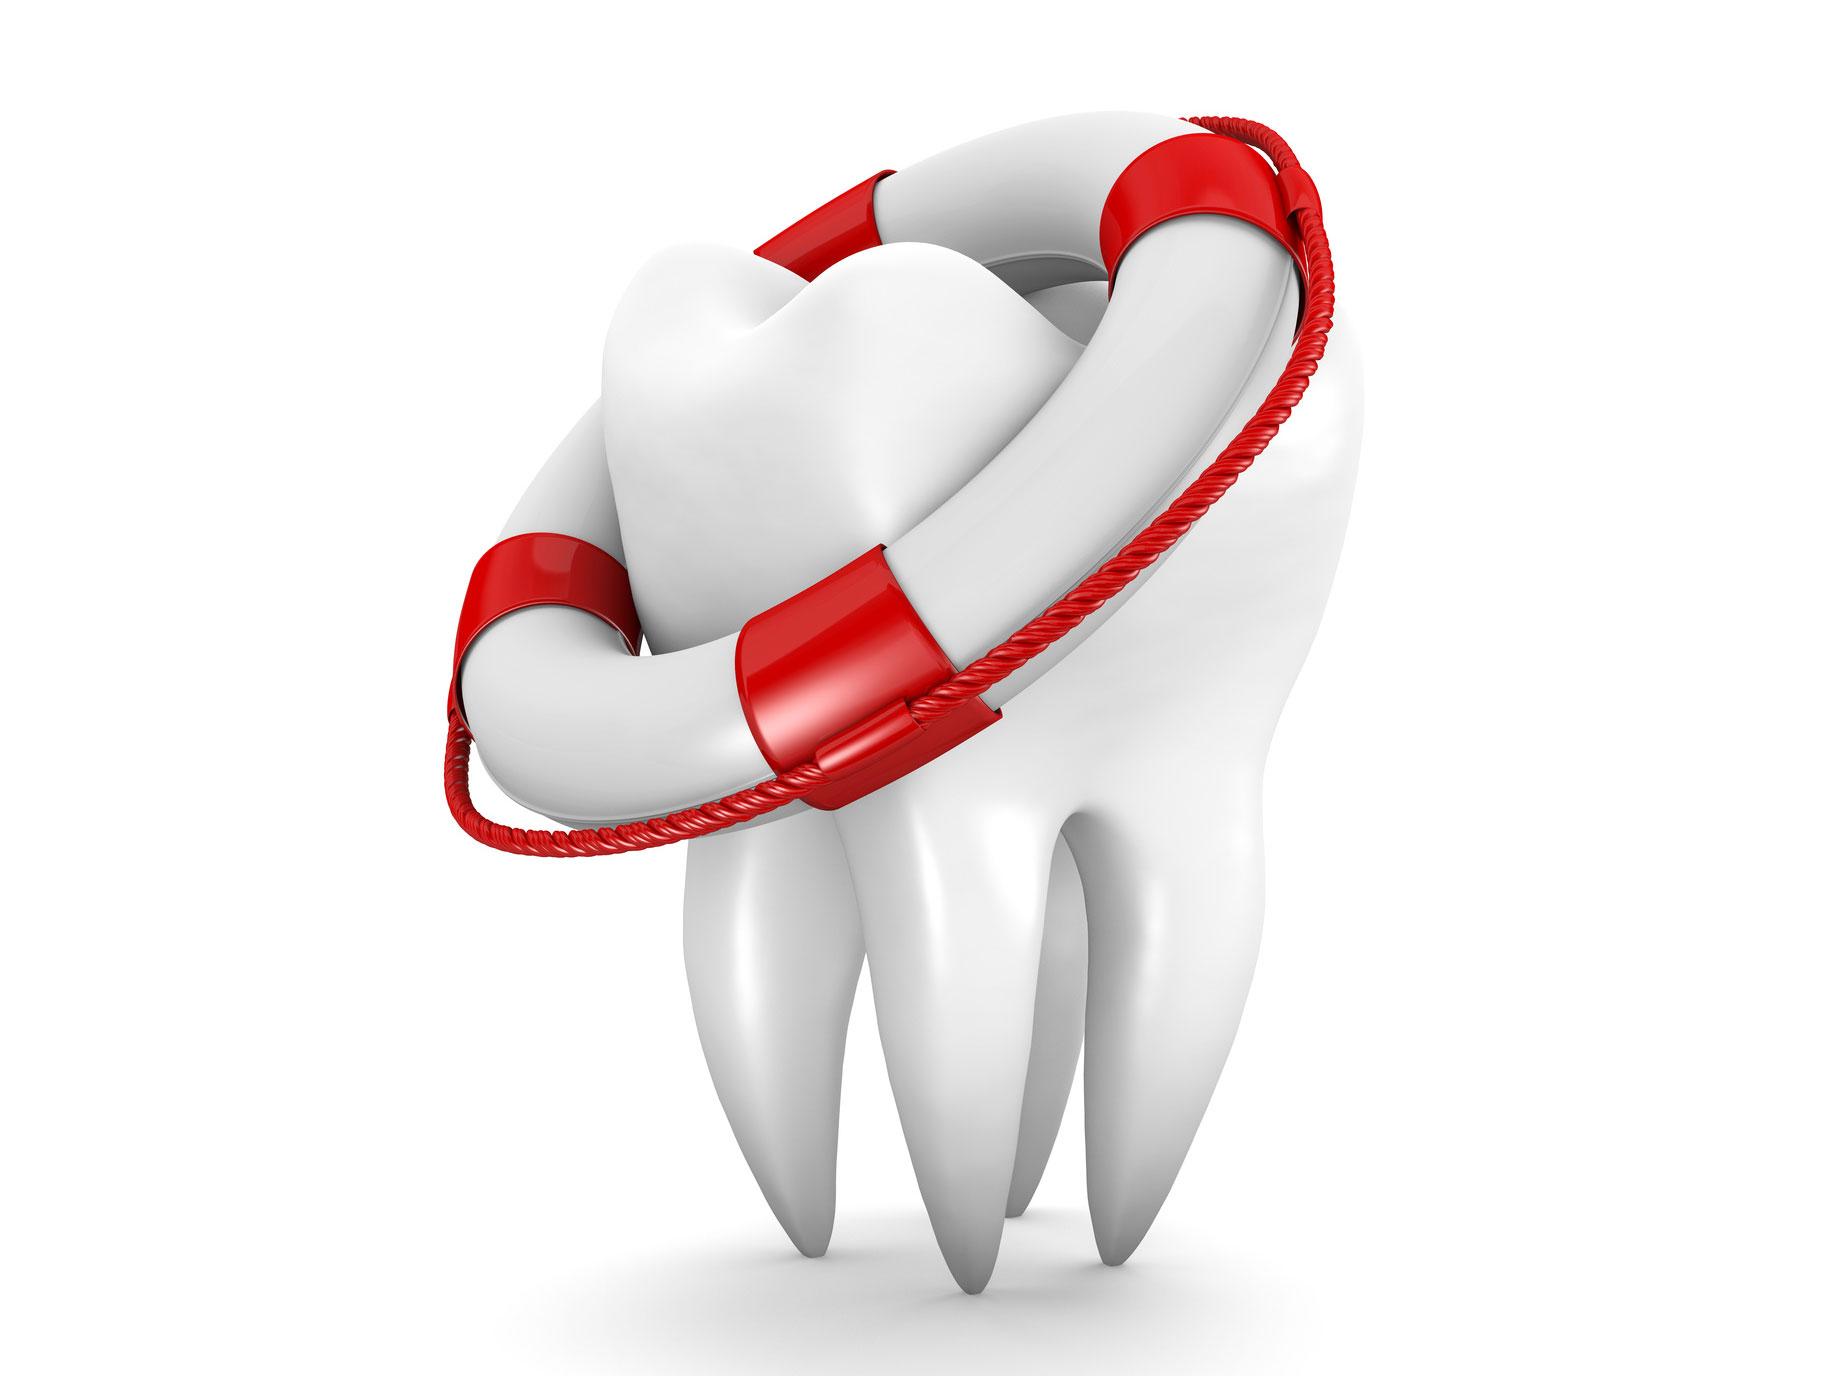 Lockere Zähne retten, sonst droht Zahnverlust